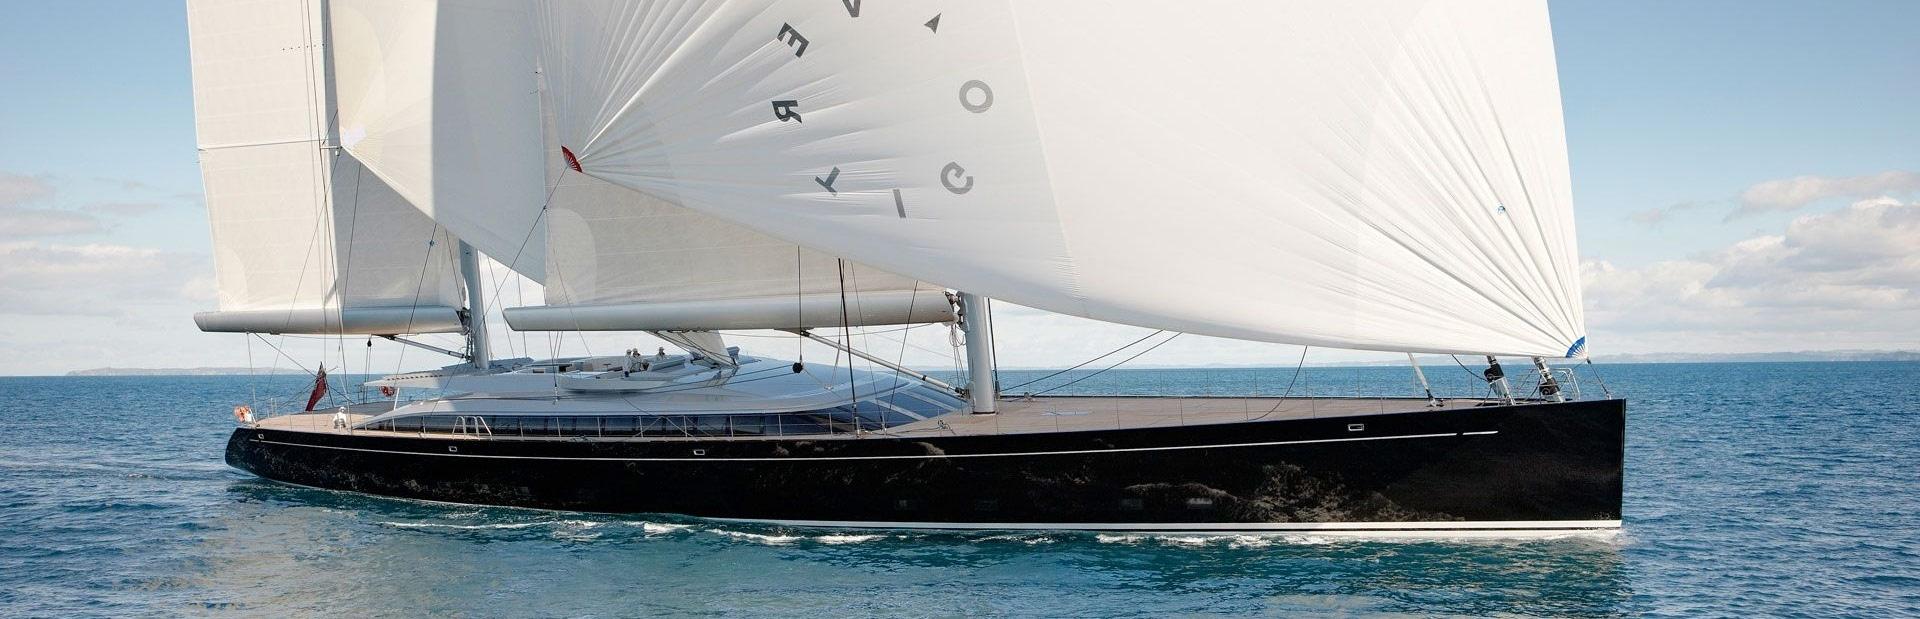 Types of Yachts | Yacht Charter Fleet